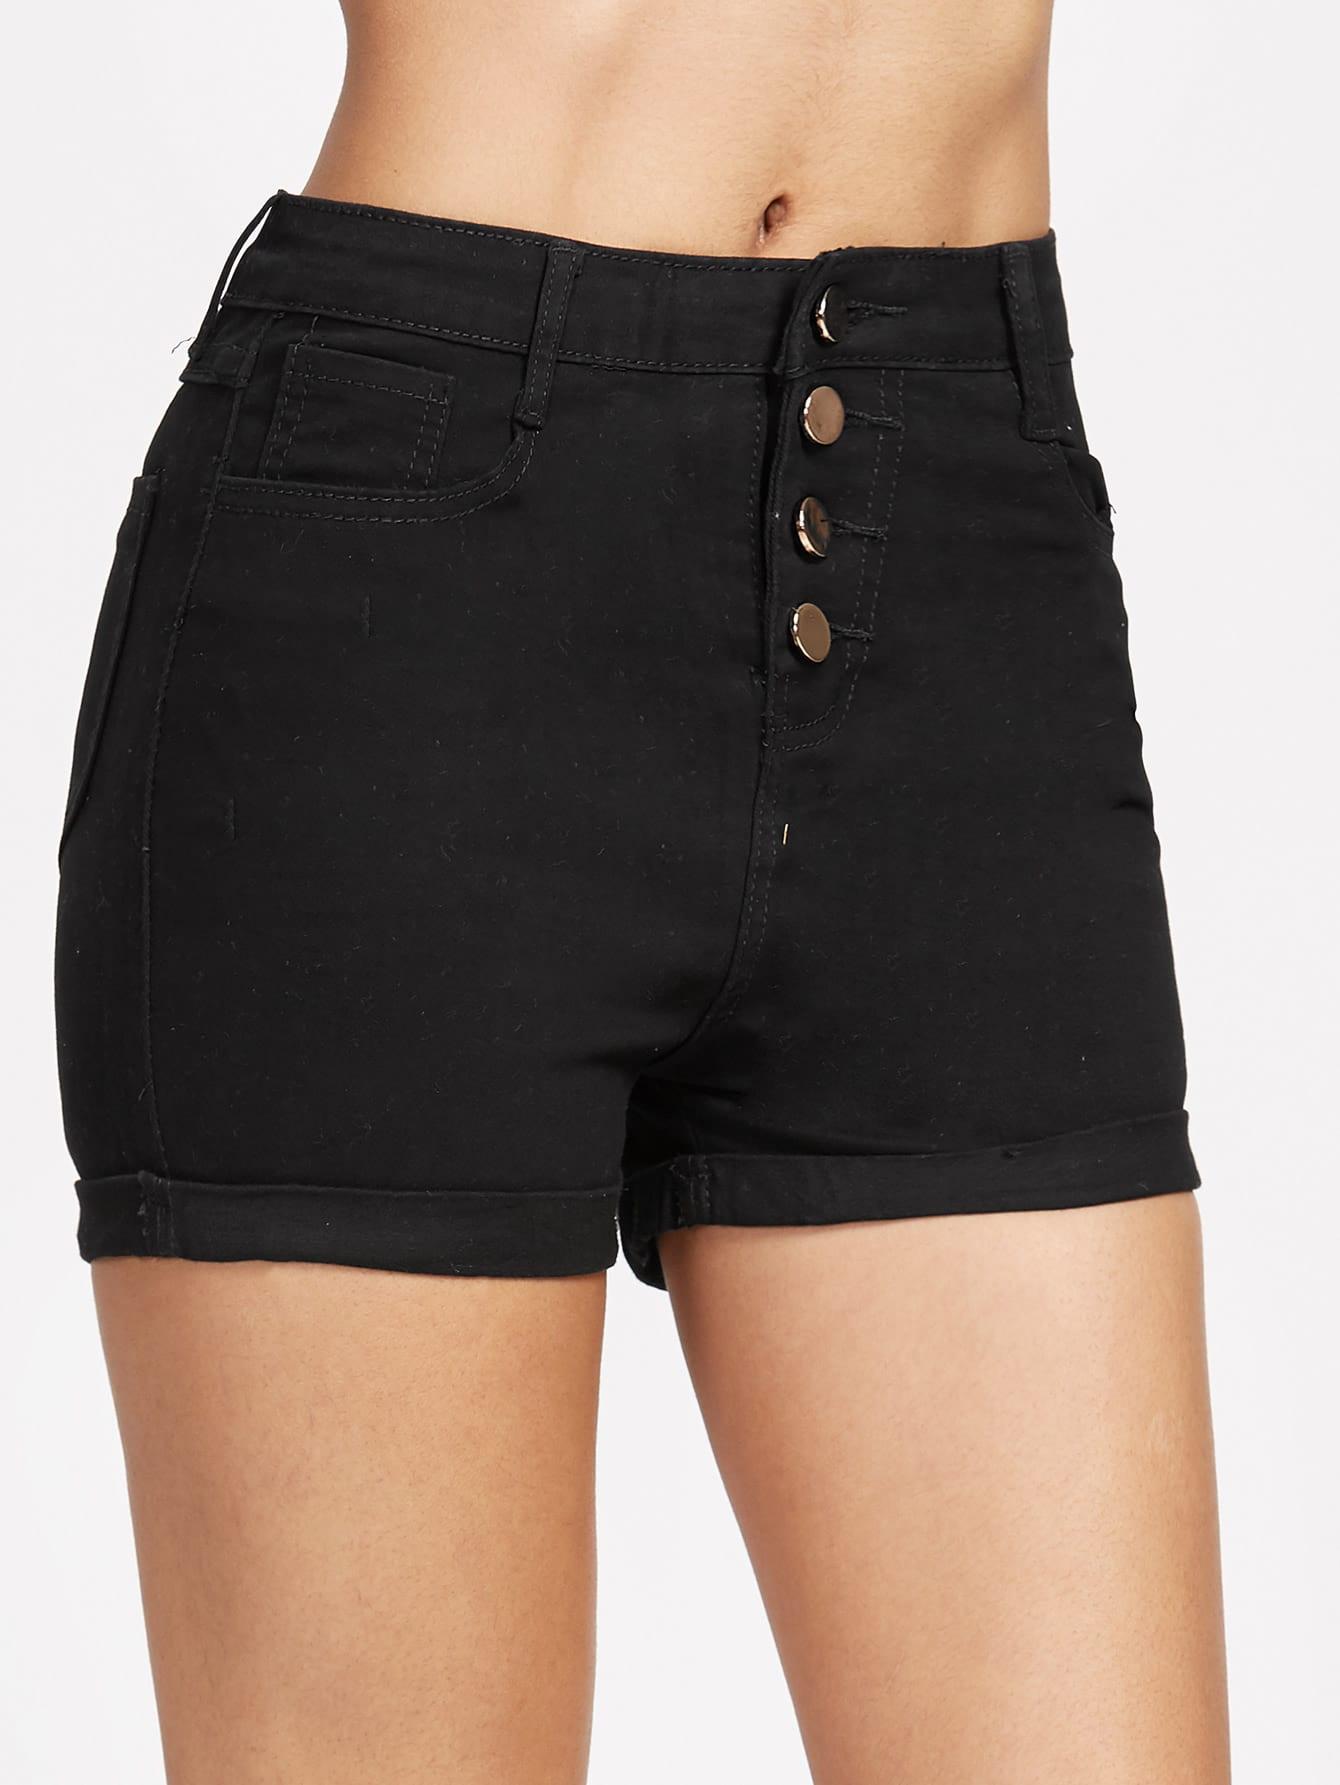 Single Breasted Cuffed Chambray Shorts